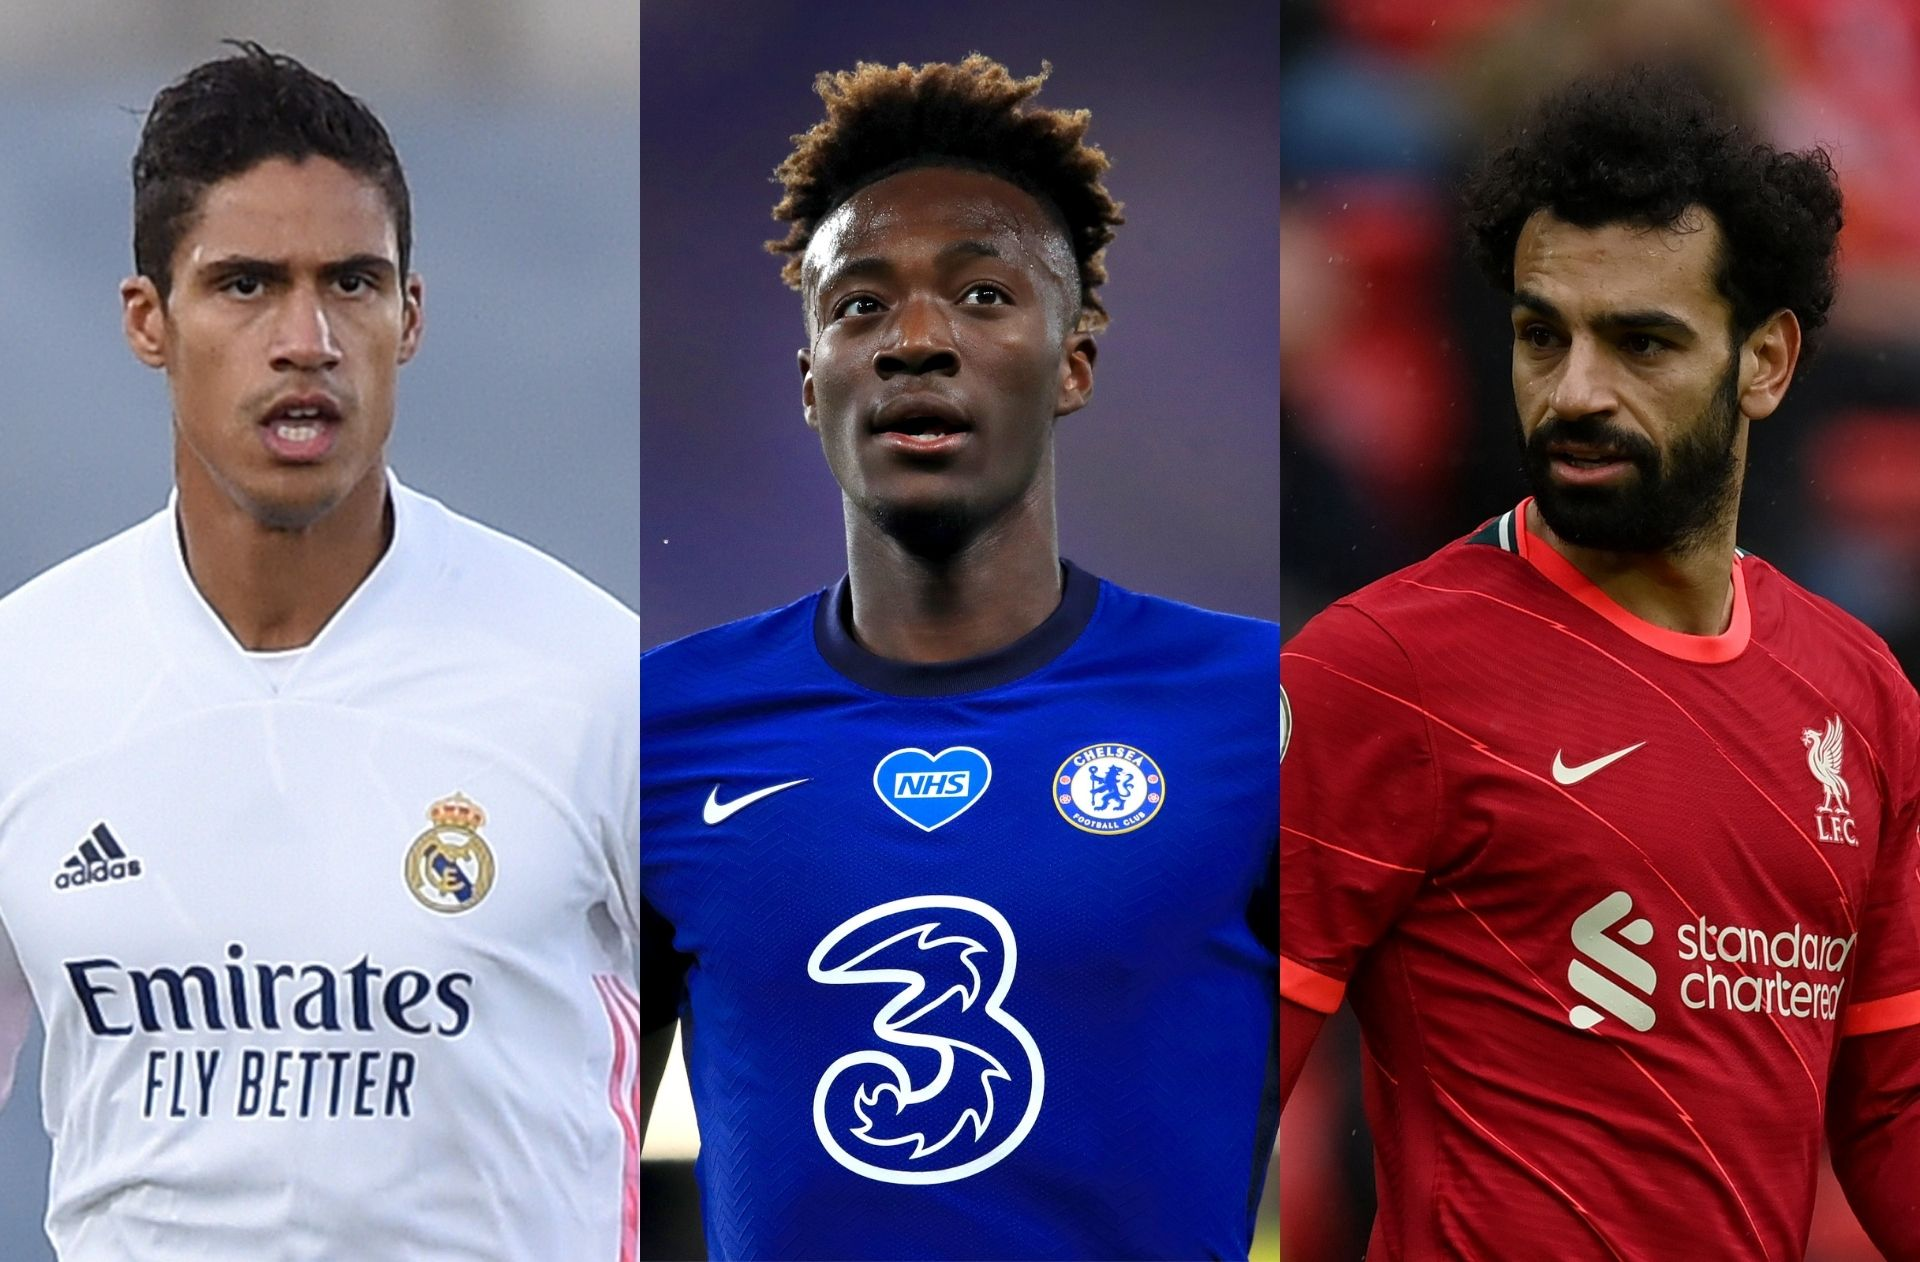 Friday's transfer rumors - Arsenal eye move for £40m Chelsea outcast